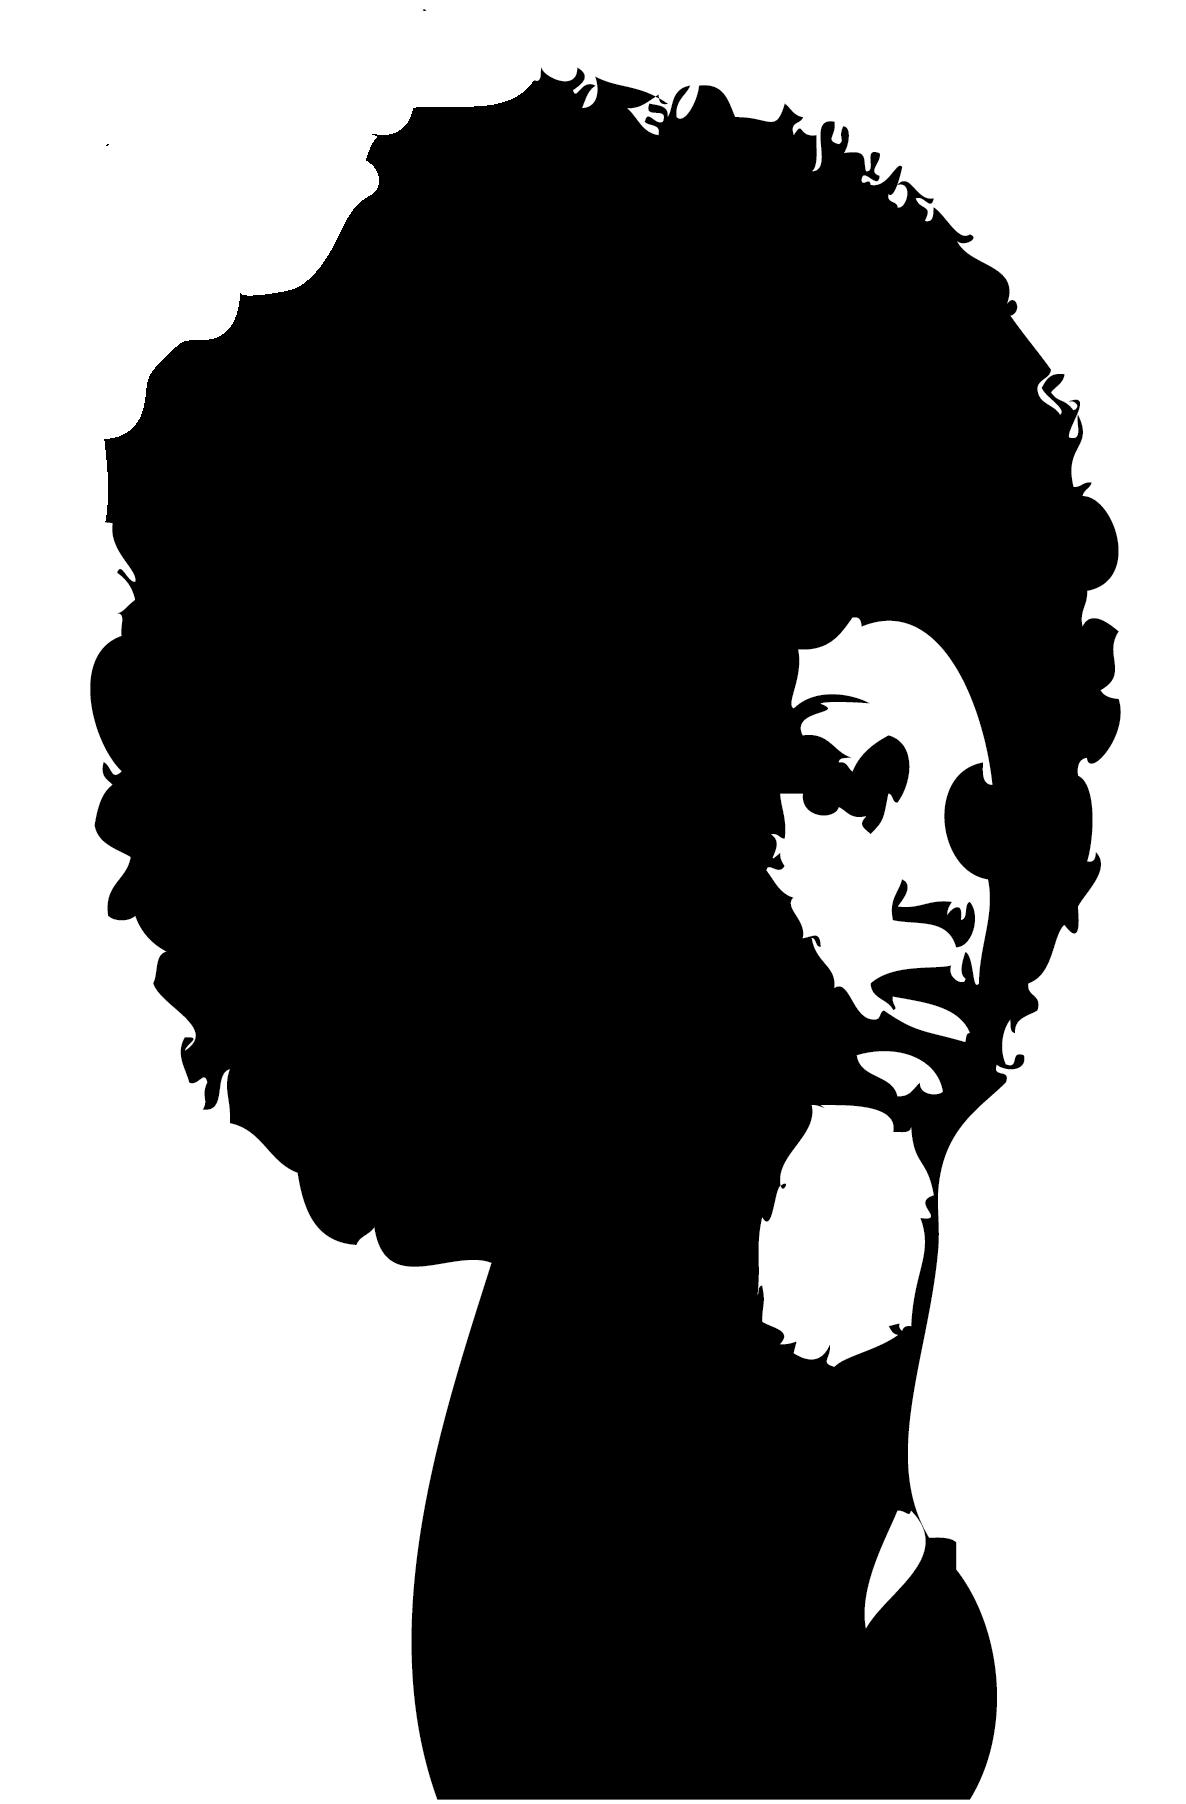 African American Hair Silhouette.